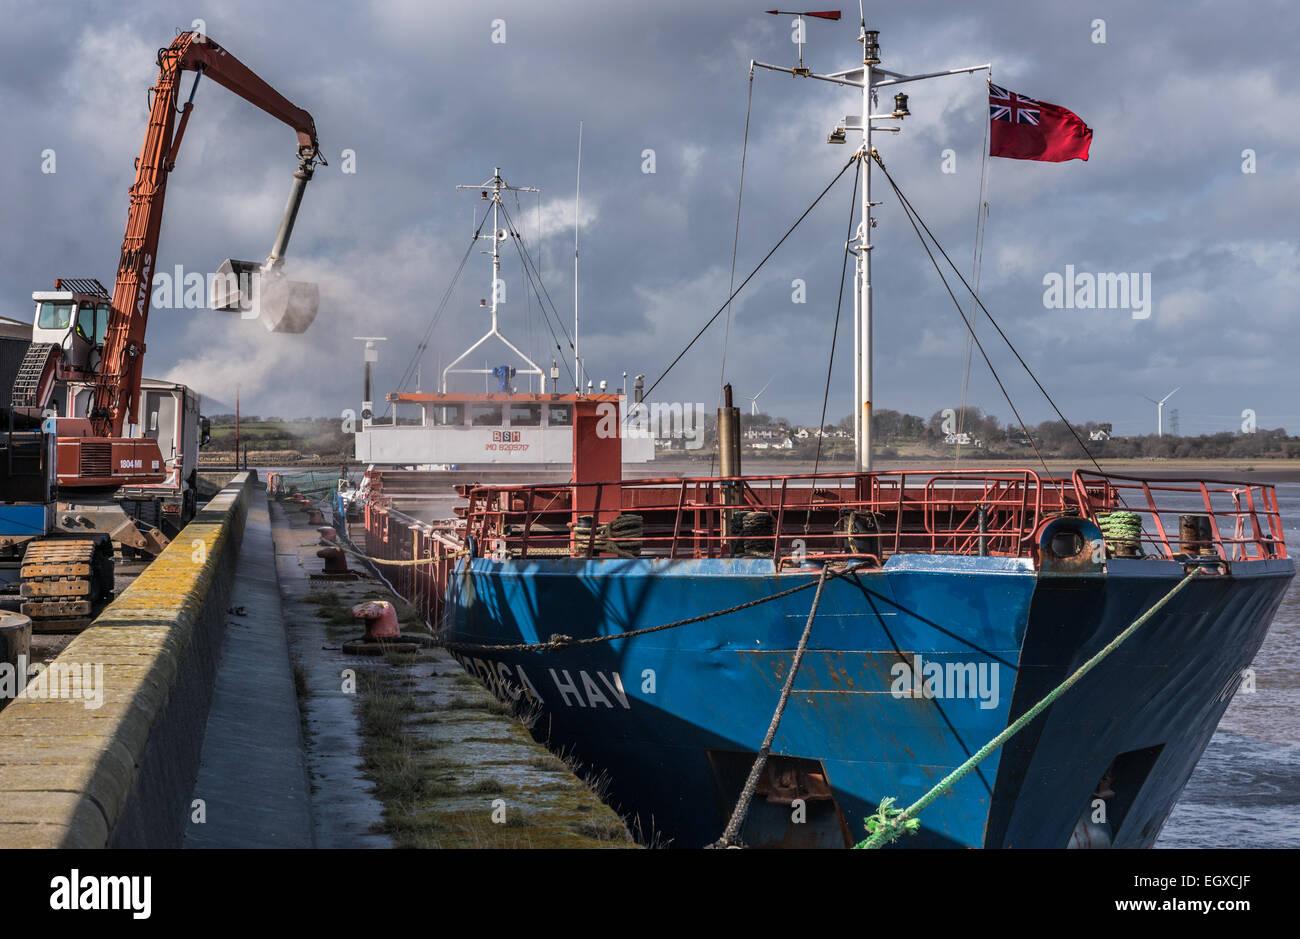 The NORDICA HAV unloading at Glasson Dock Stock Photo